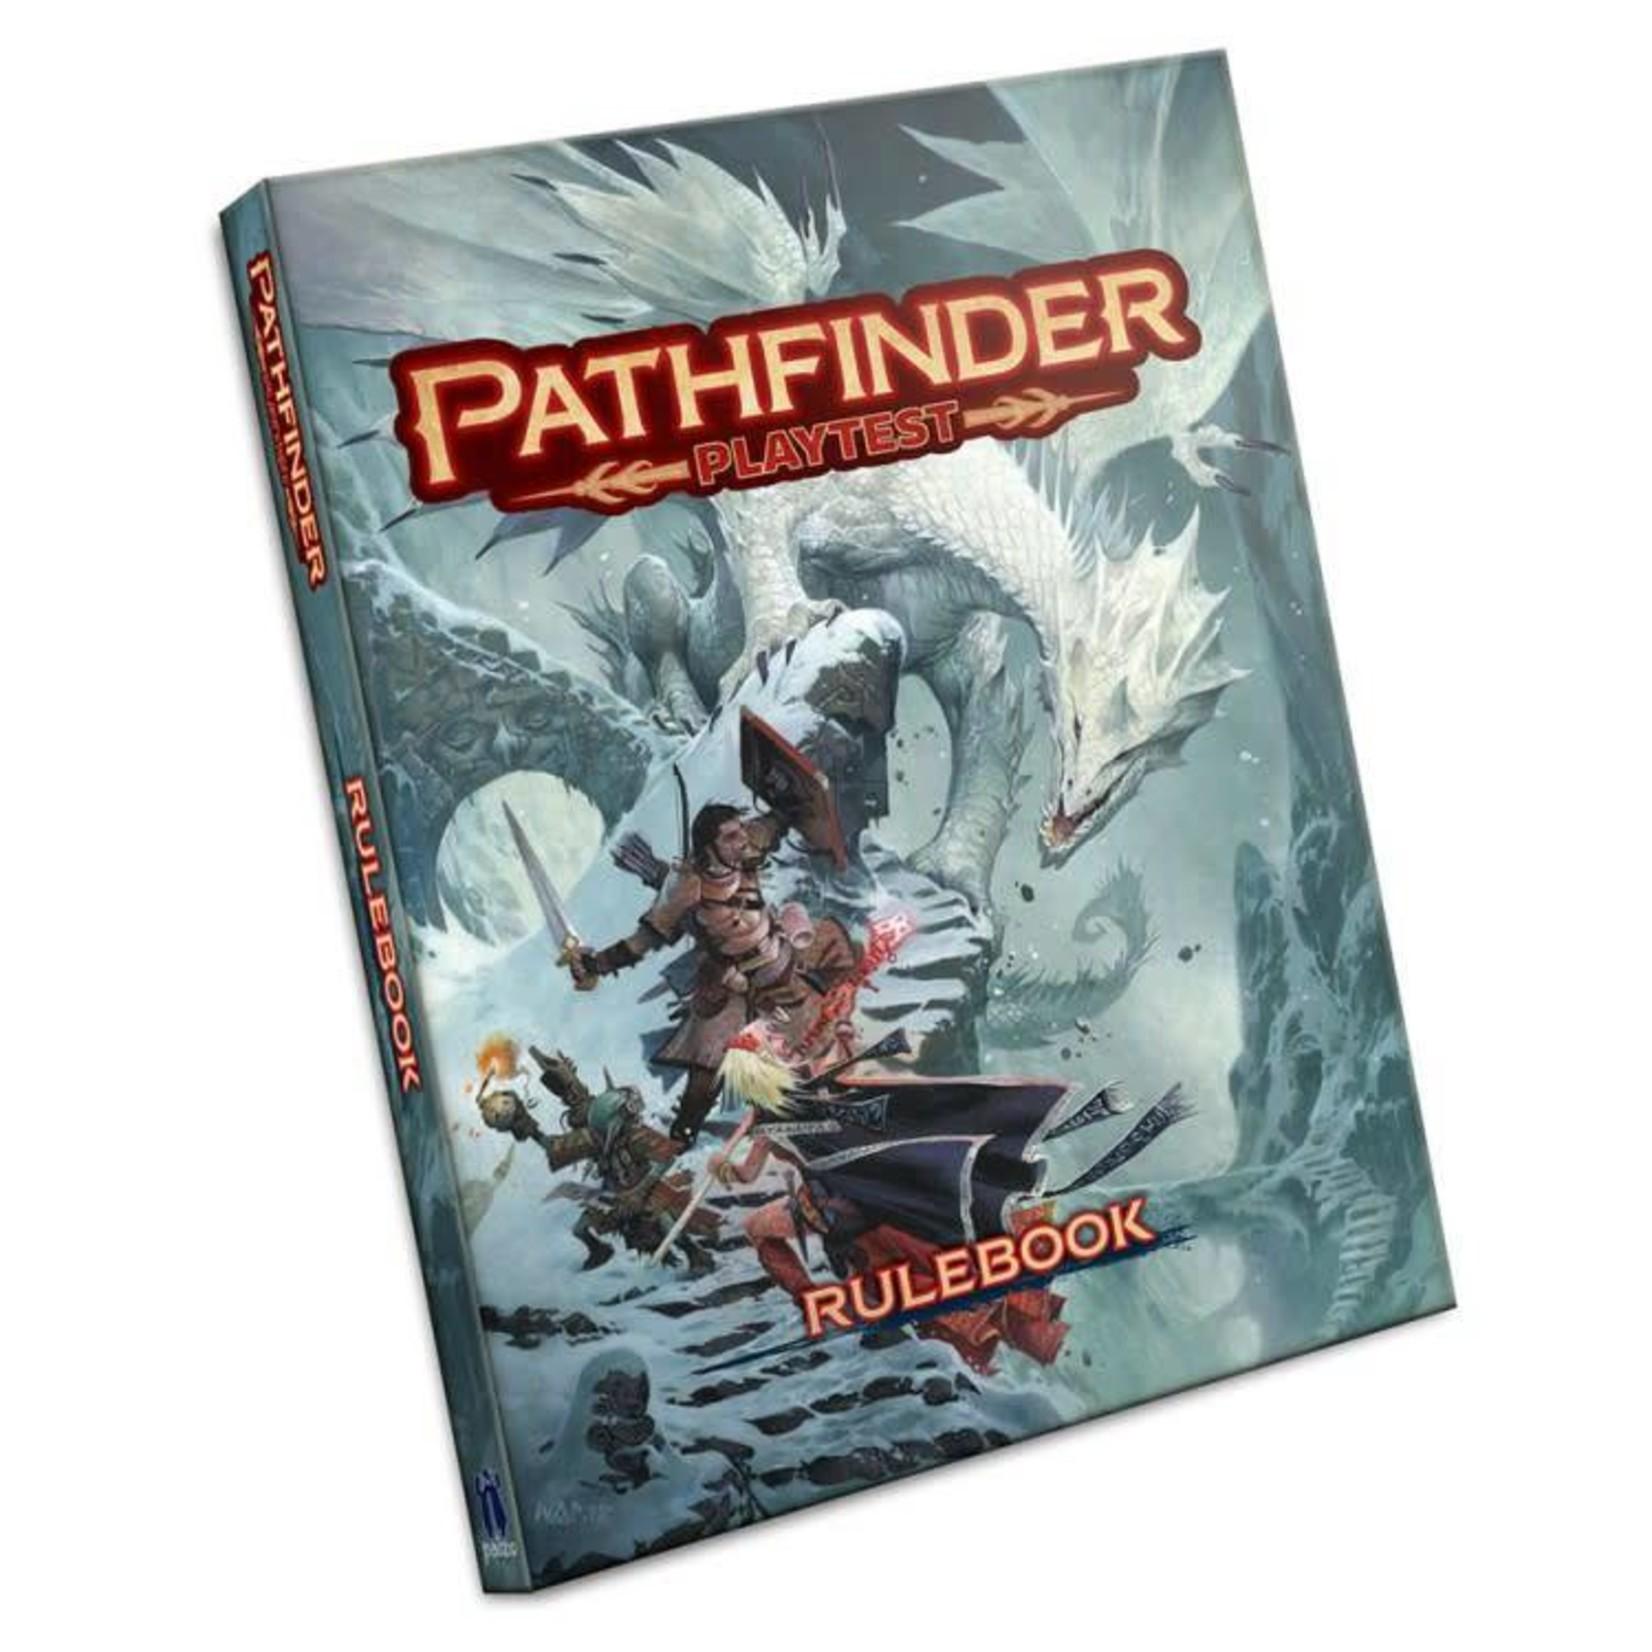 Paizo Pathfinder Roleplaying Game 2.0: Playtest Rulebook - Hardcover